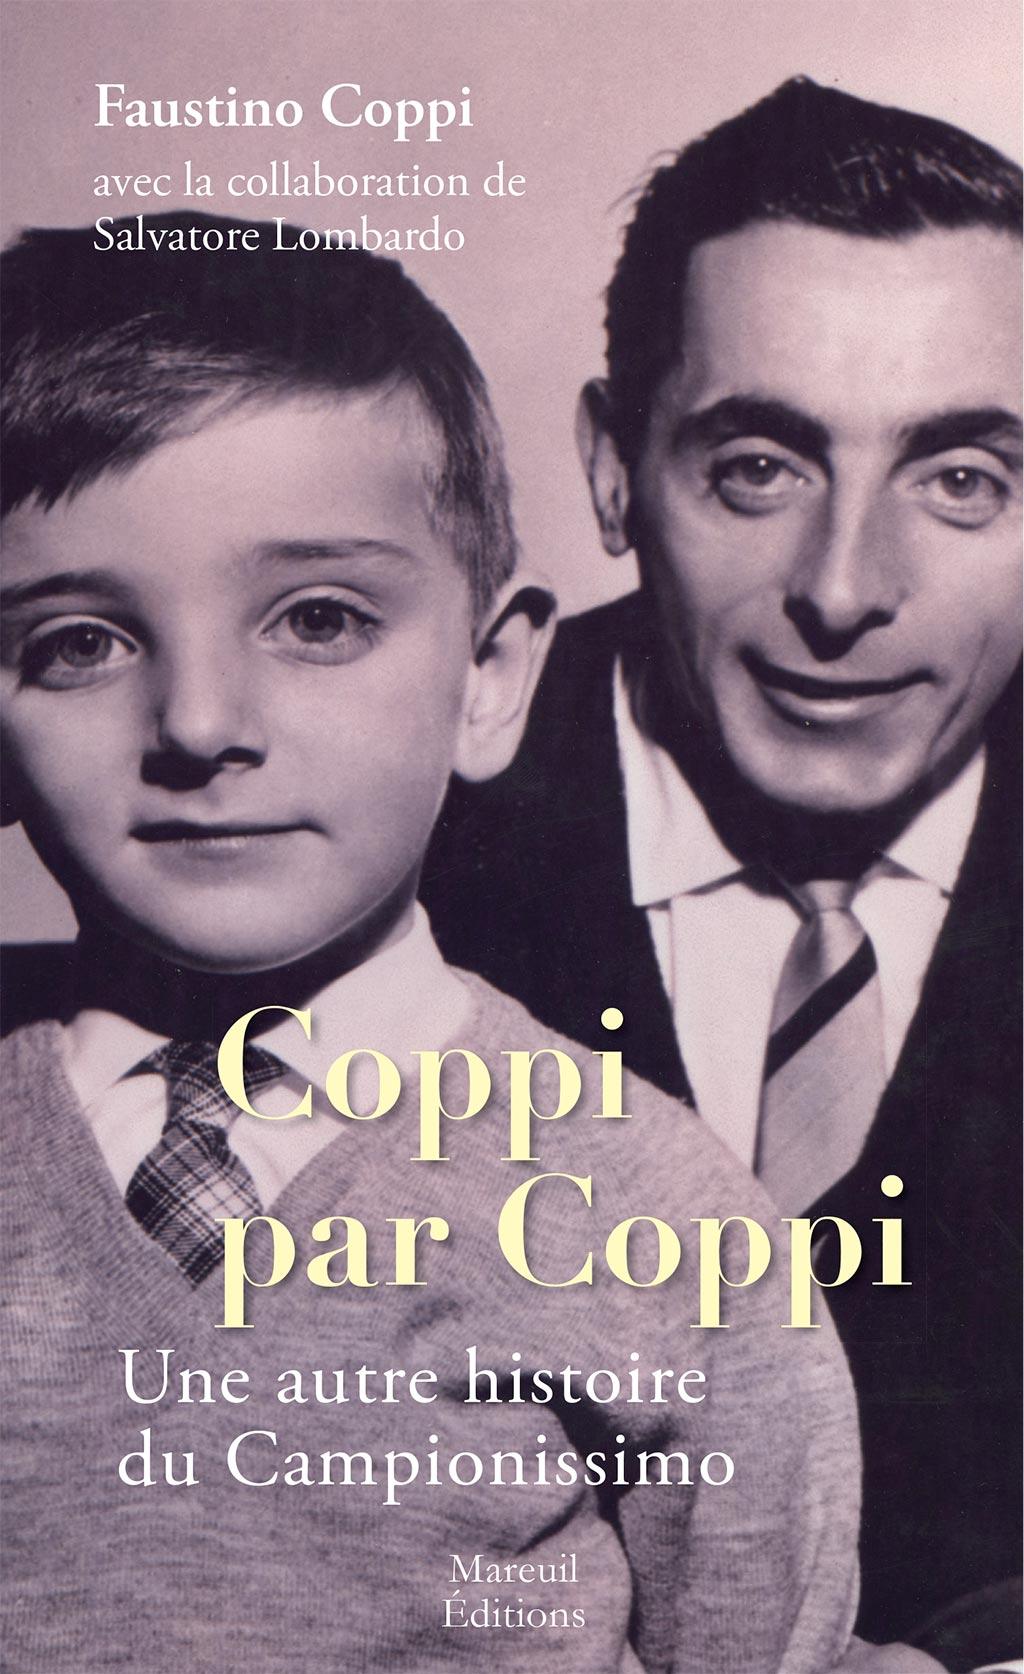 COPPI par COPPI, Une autre histoire du Campionissimo !